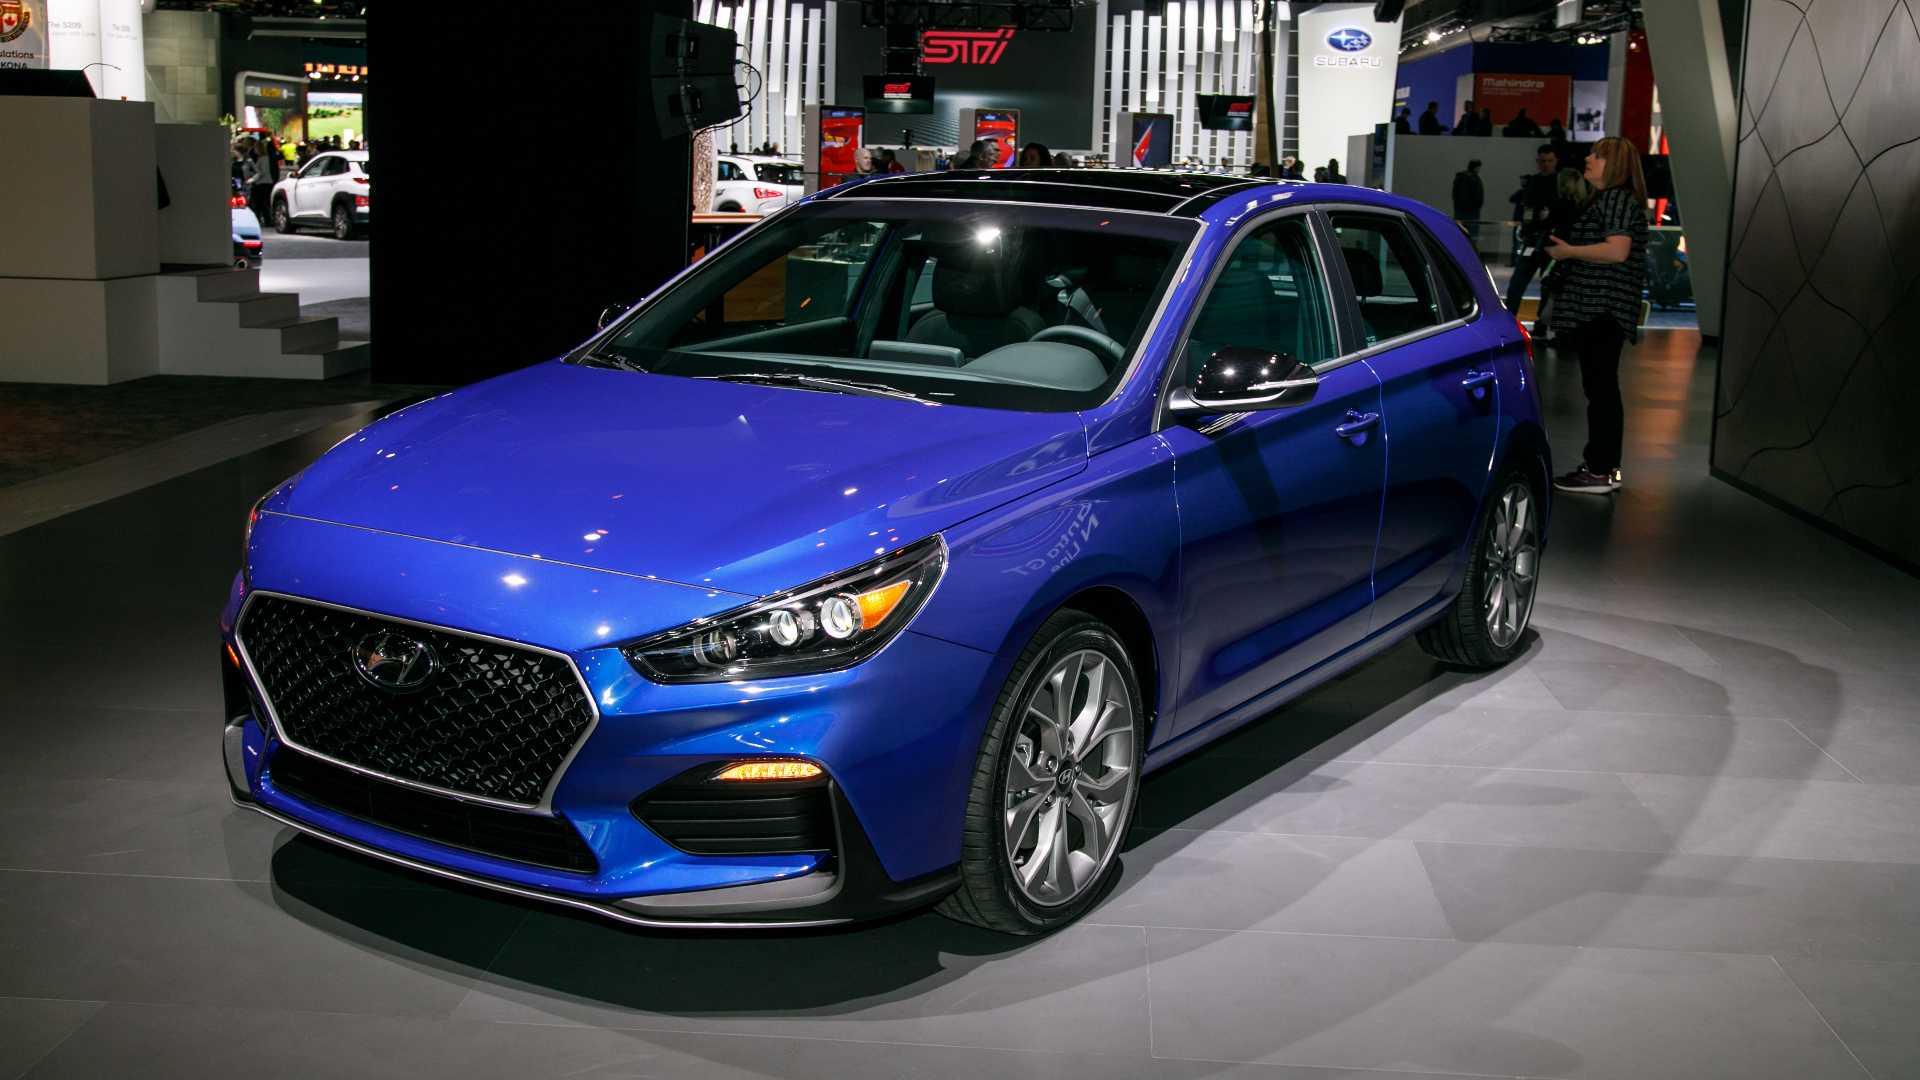 54 All New 2020 Hyundai Elantra Gt New Review with 2020 Hyundai Elantra Gt